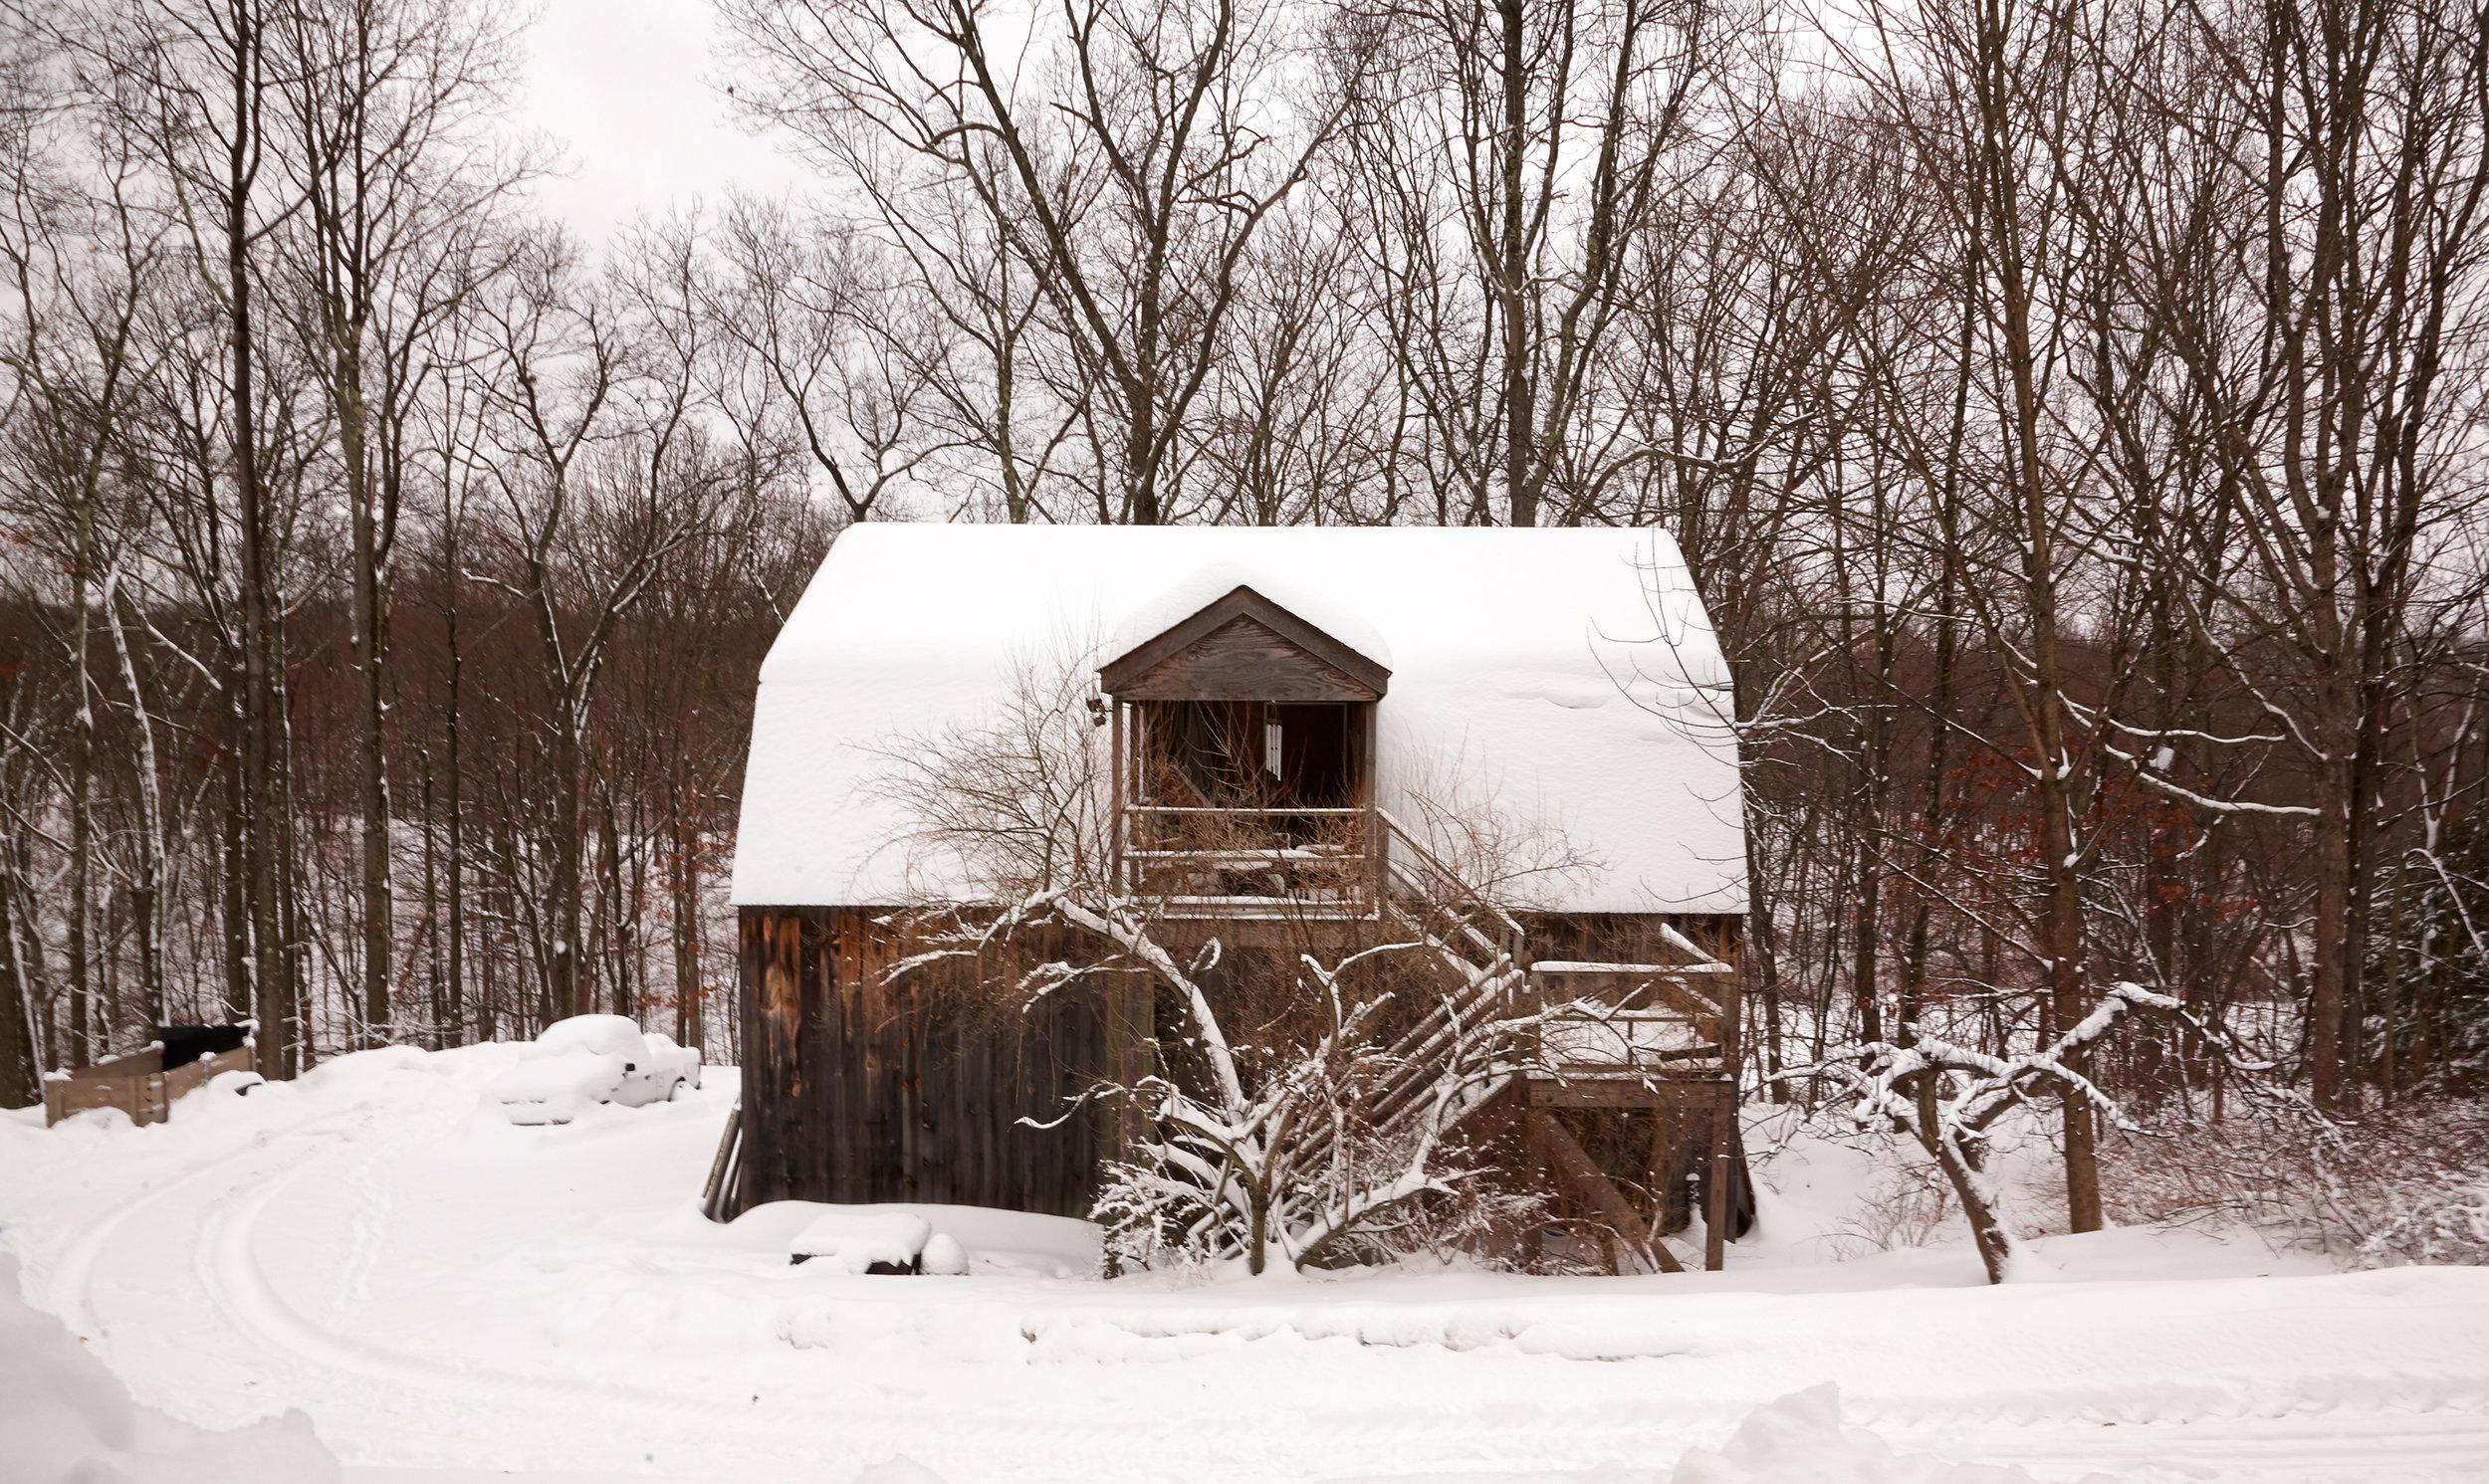 BARN-IN-SNOW-AT-WILTSHIRE-FARM-©JONATHAN-R.-BECKERMAN-PHOTOGRAPHY.jpg